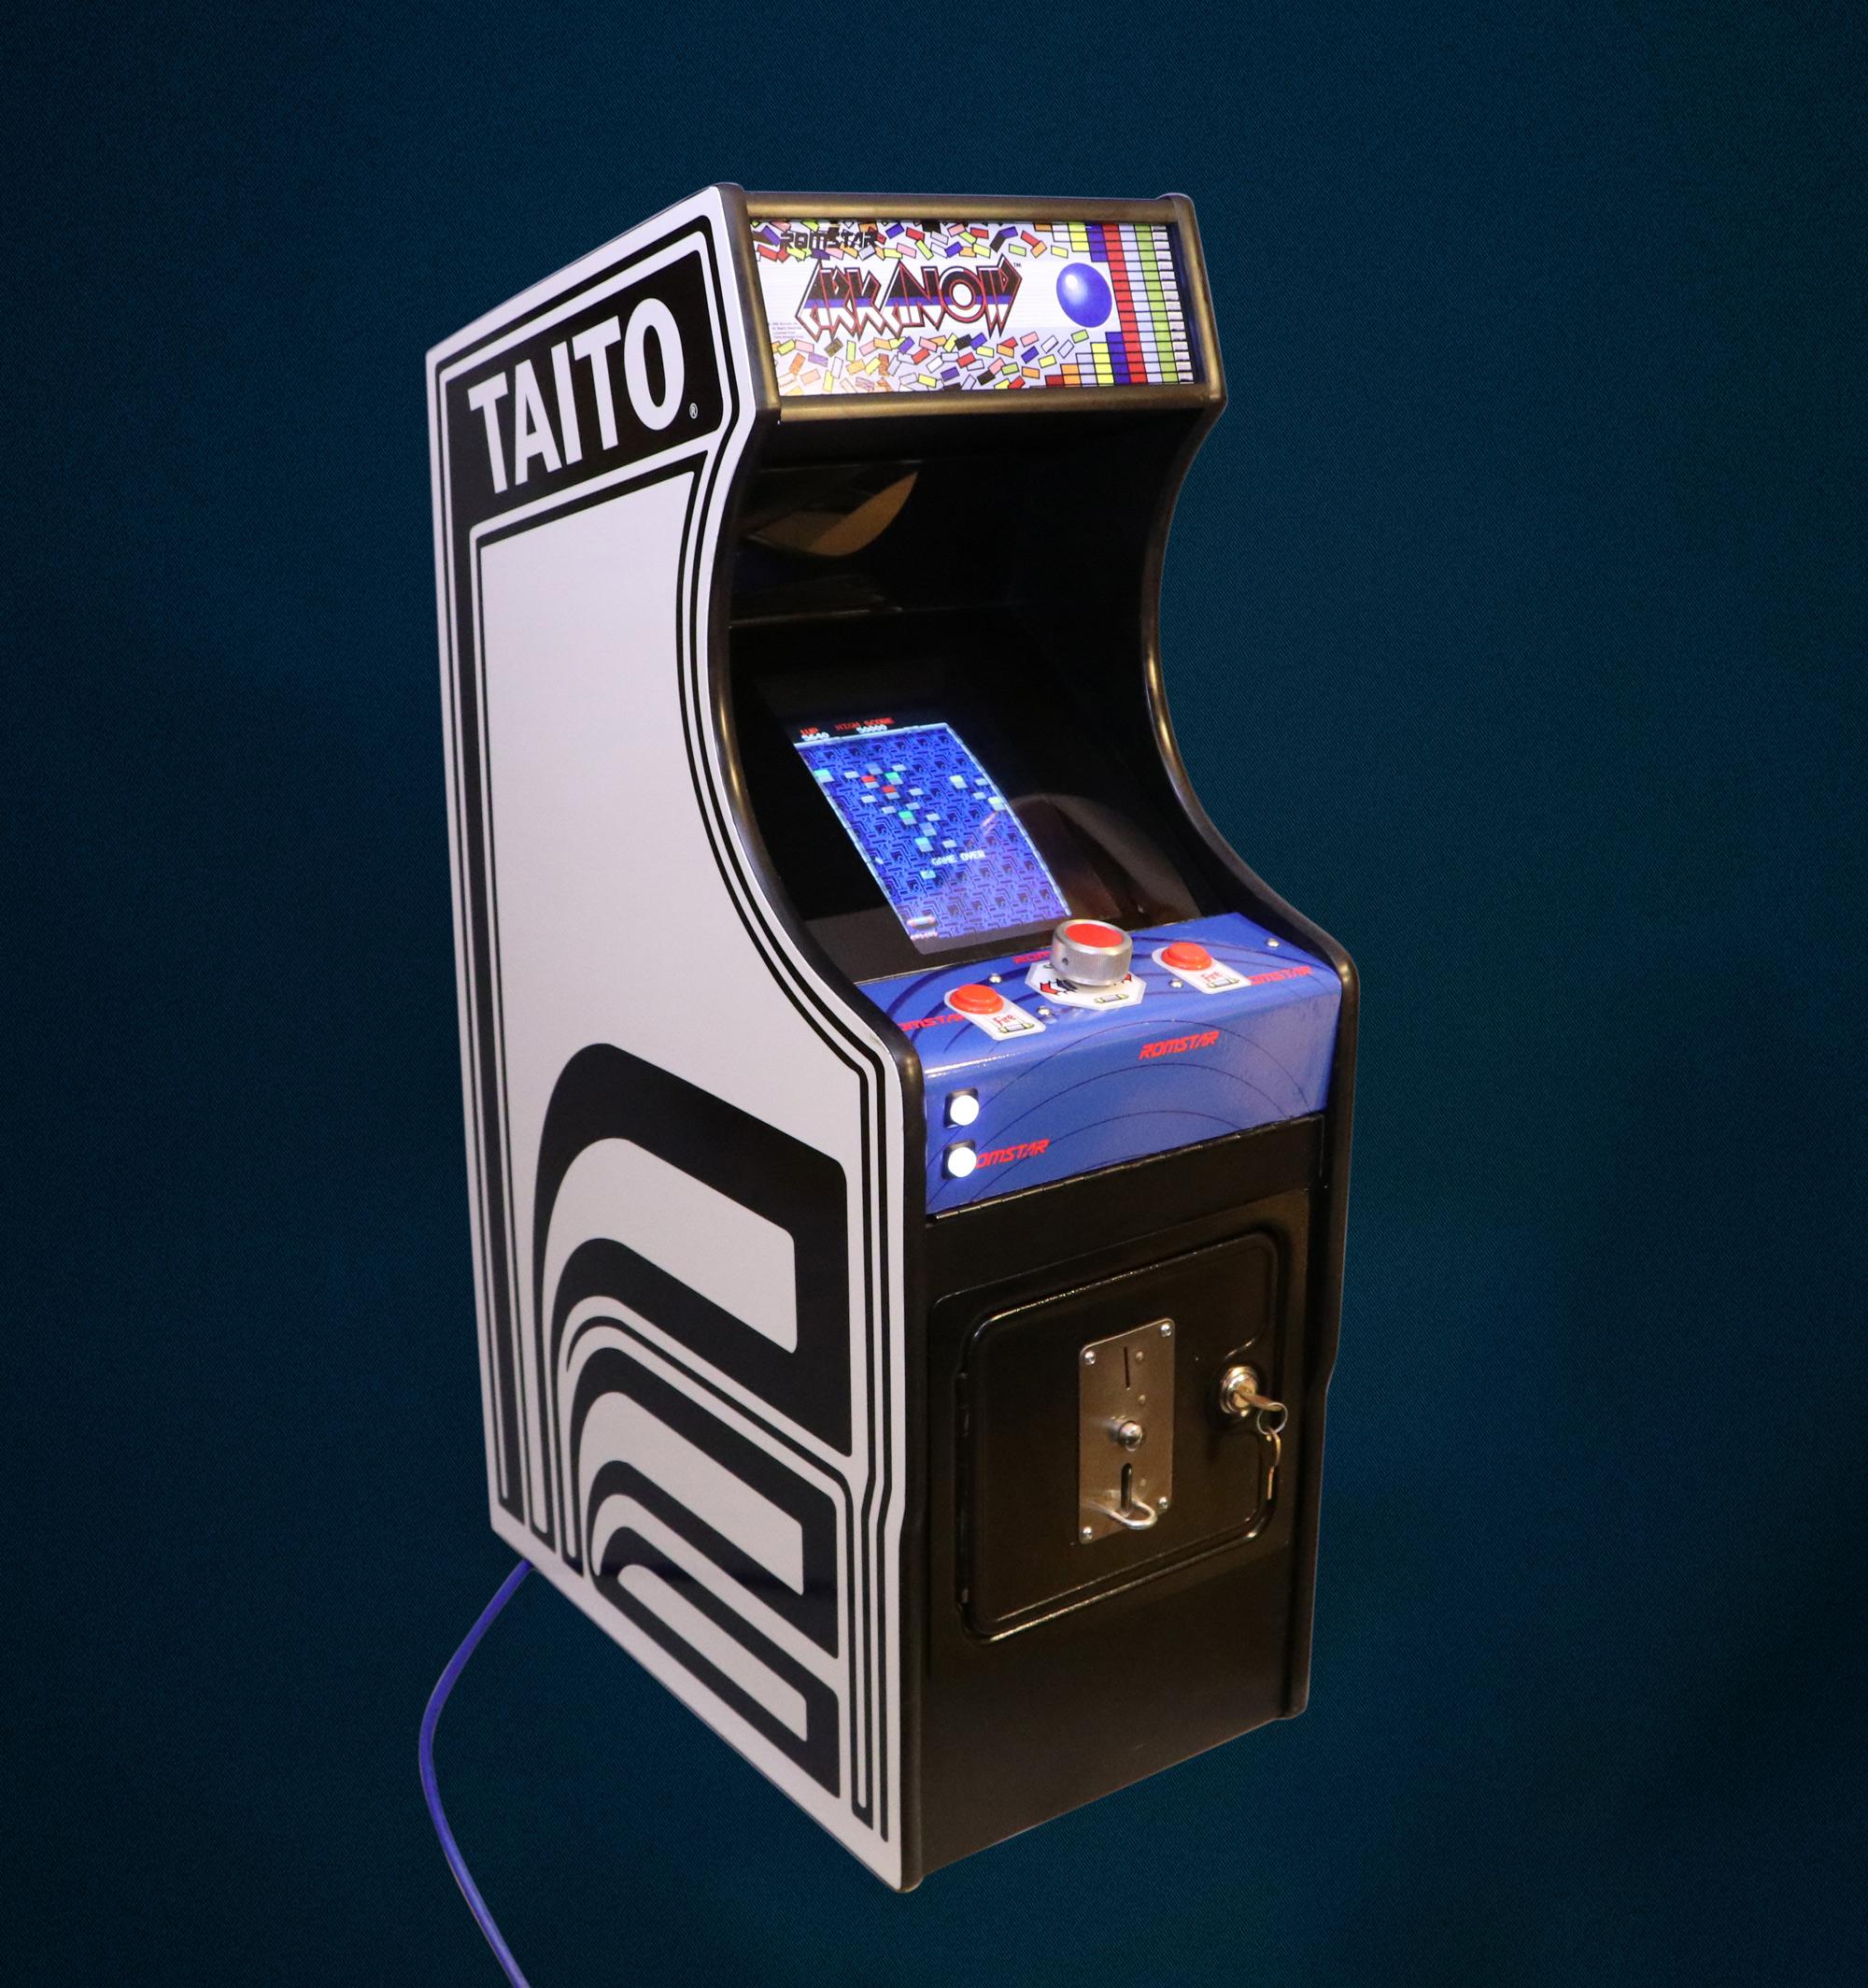 Arkanoid Small Change Arcade